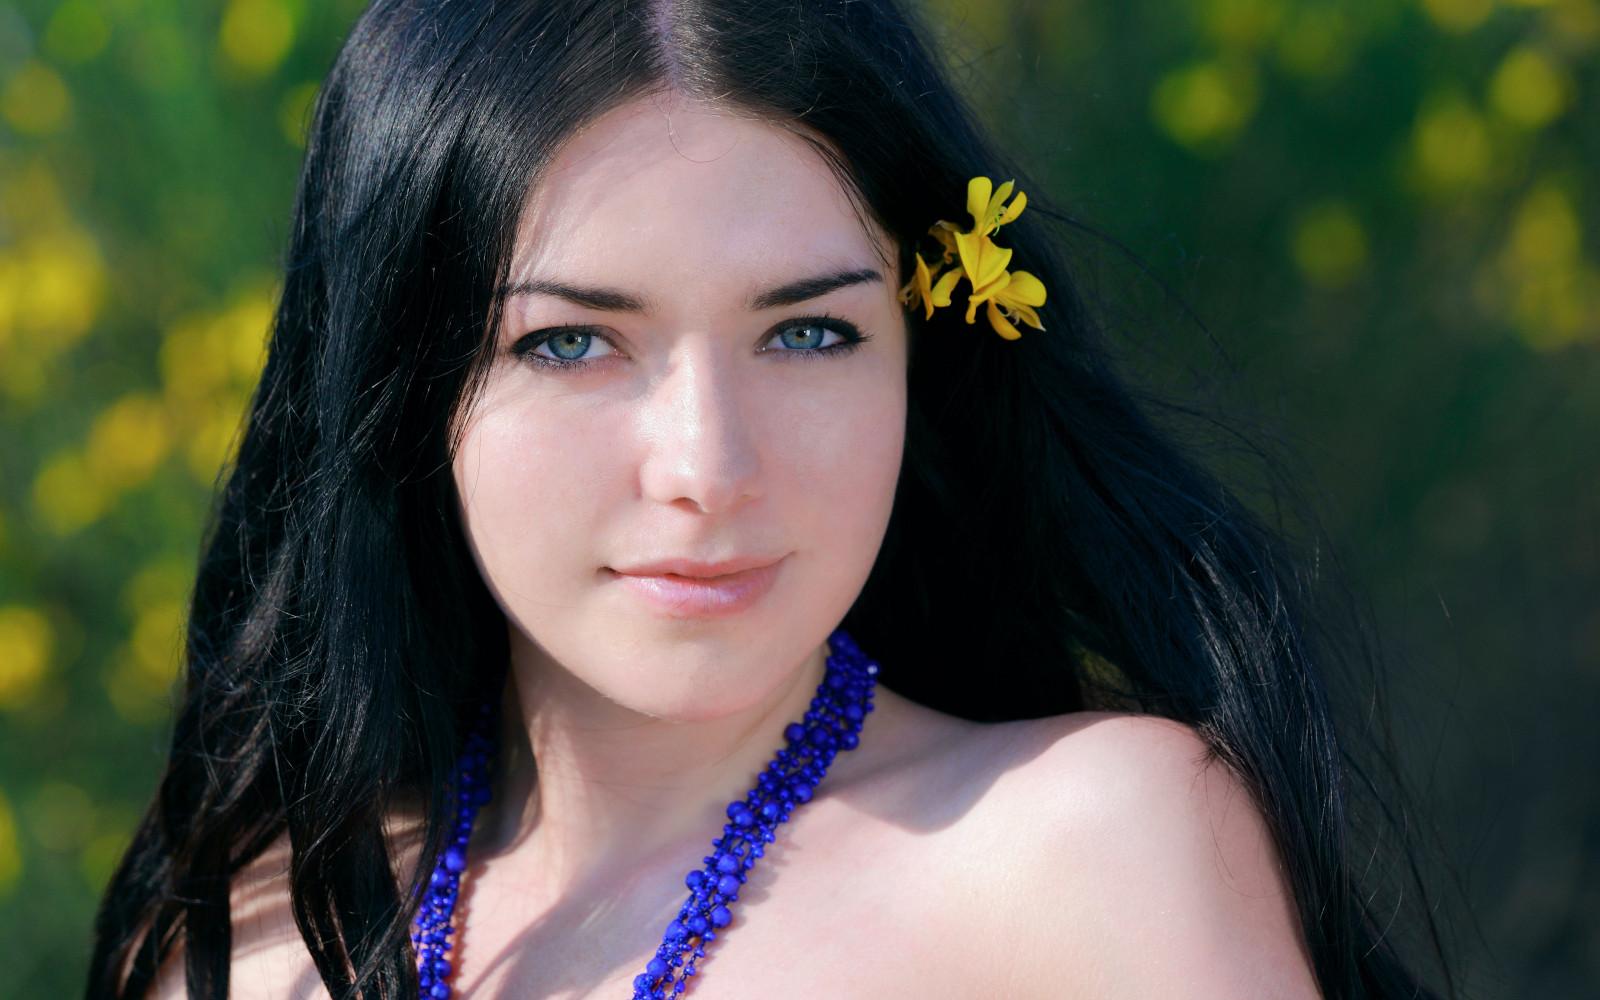 Wallpaper Face Women Model Long Hair Blue Eyes: Wallpaper : Face, Women Outdoors, Model, Long Hair